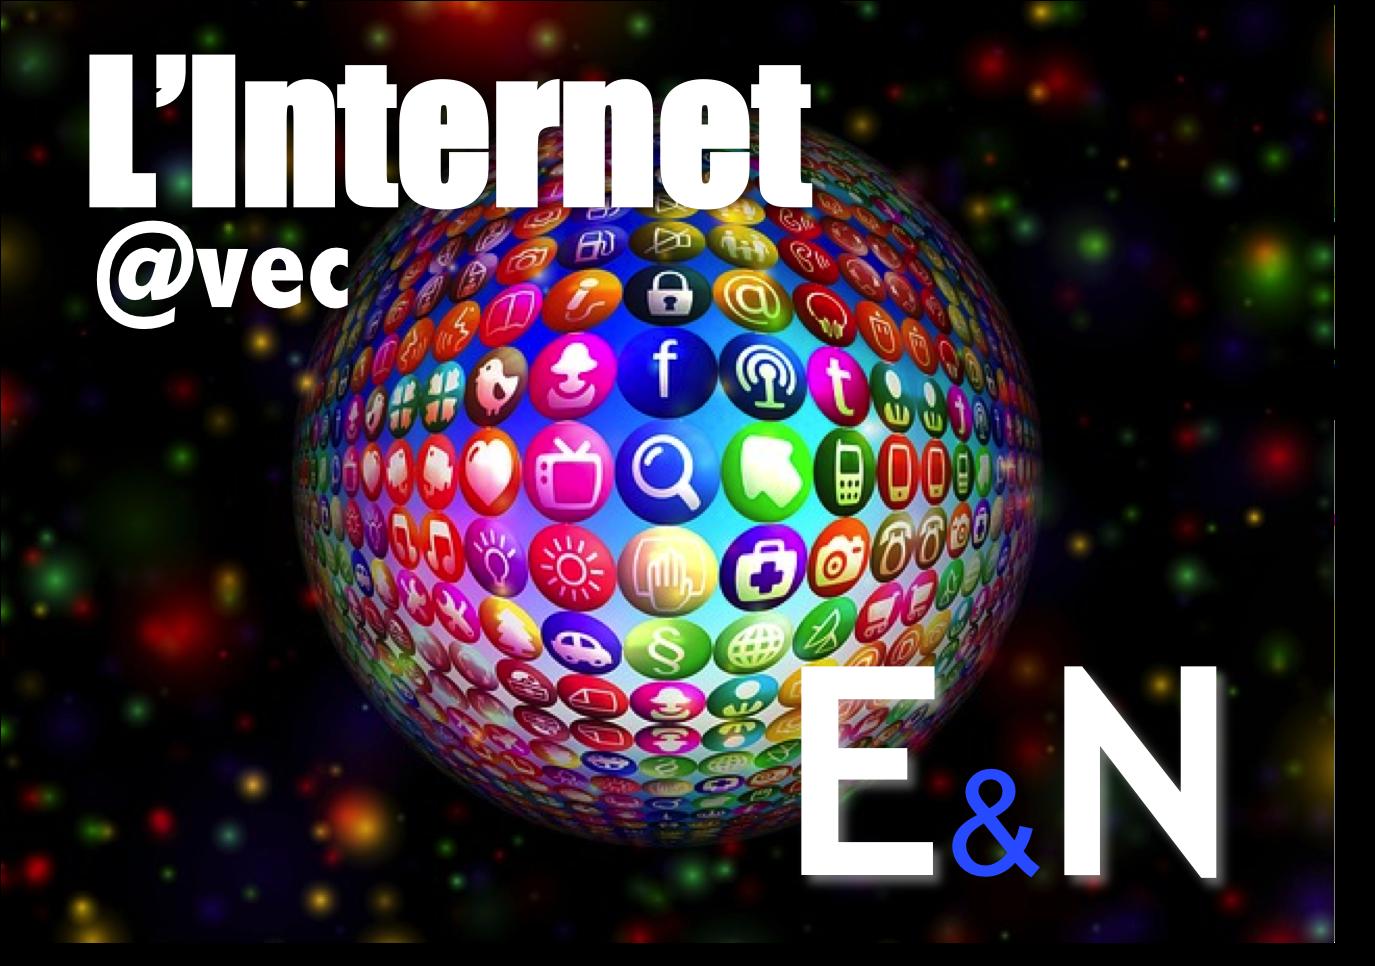 L'internet avec E&N